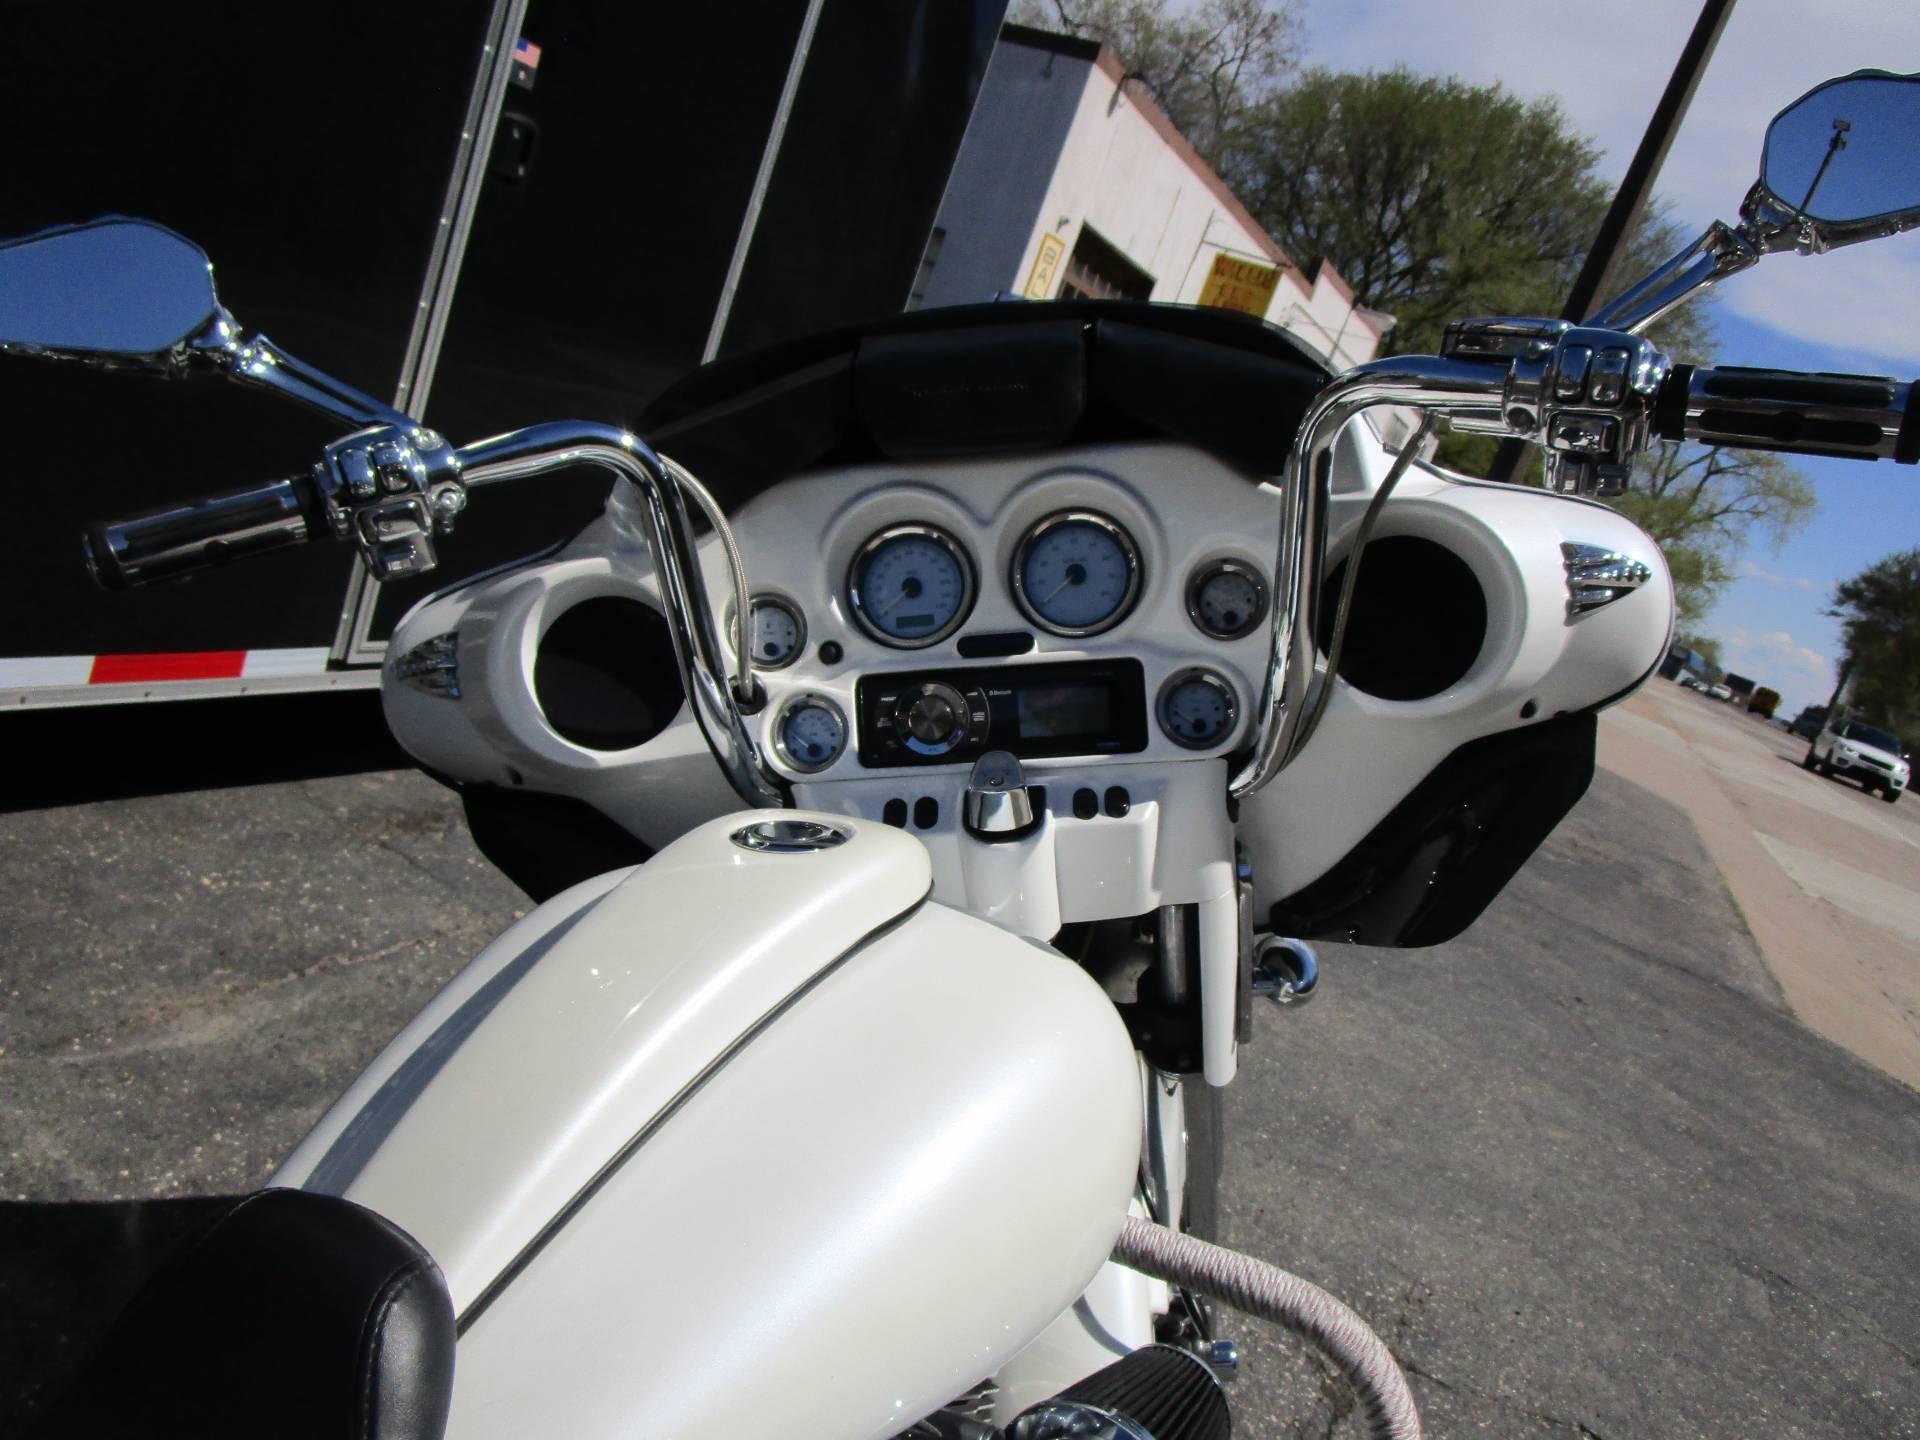 2008 Harley-Davidson FLHX STREET GLIDE 12